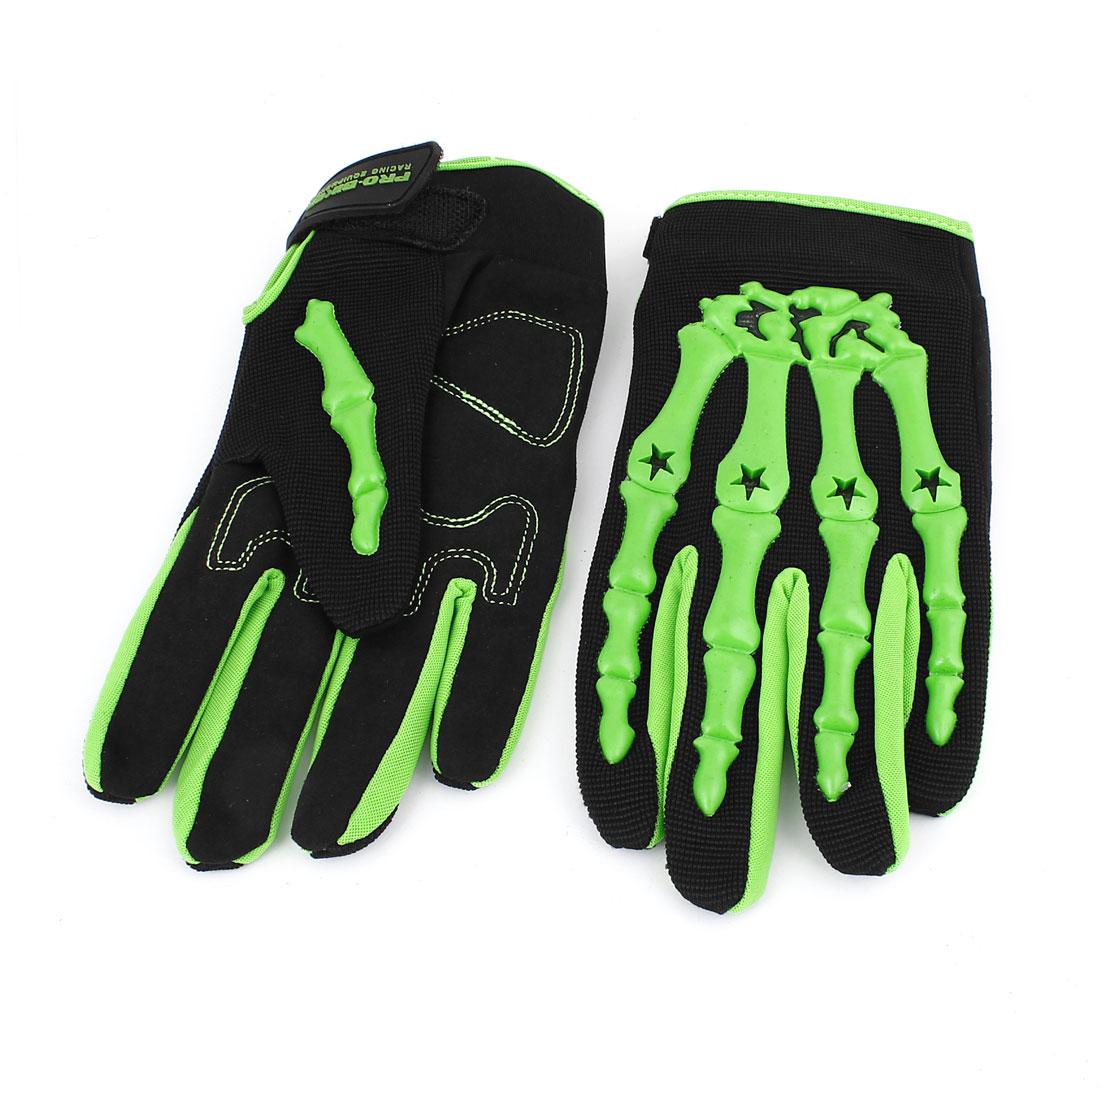 Pair Mens Full Finger Motorcycle Racing Cycling Armor Motocross Gloves Black Green L